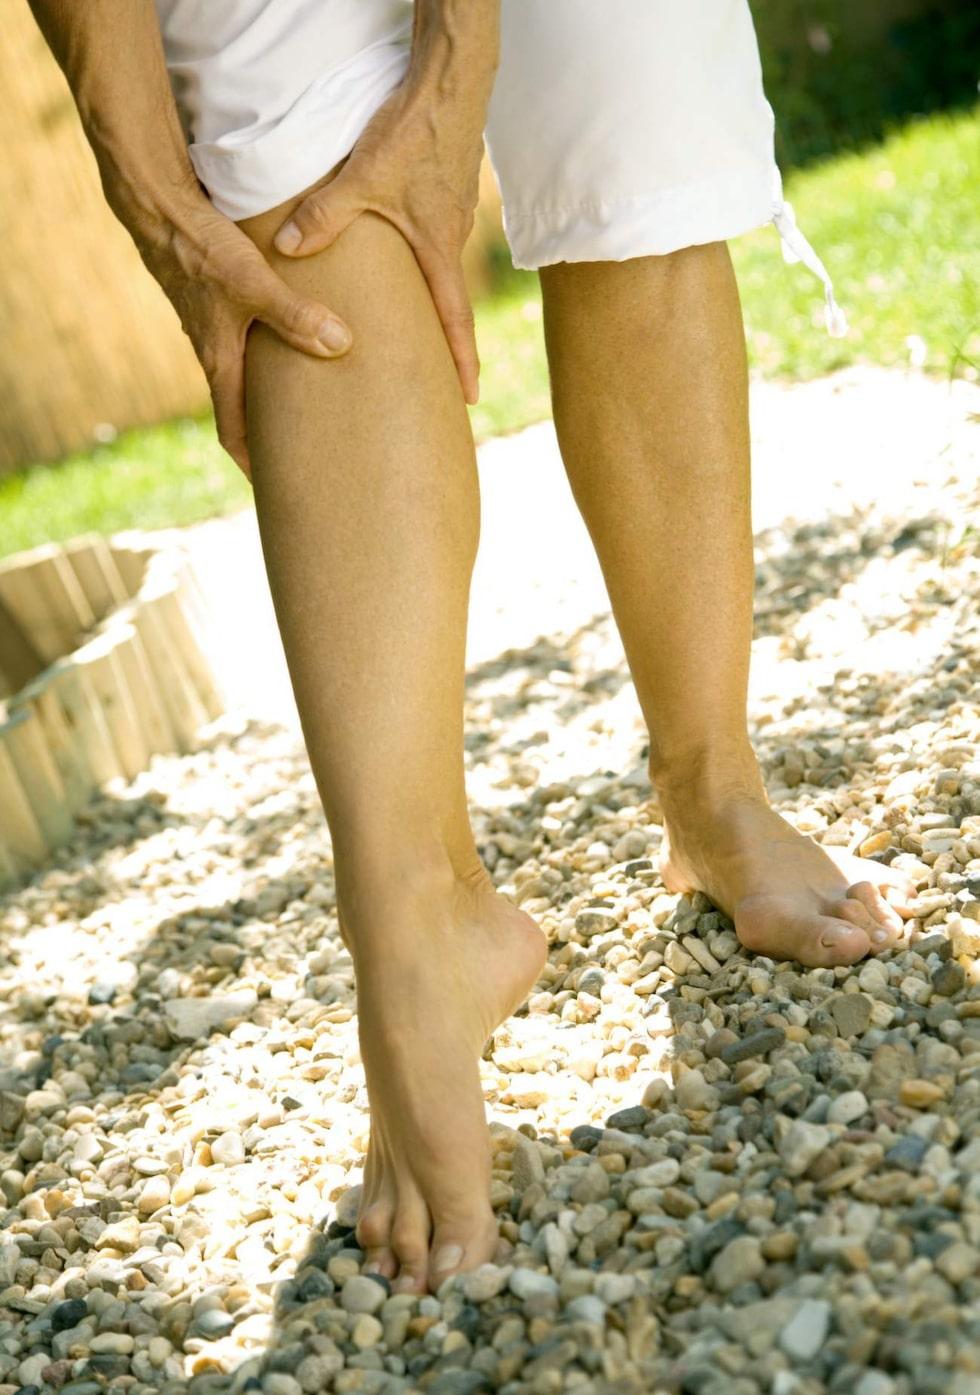 Kramp i benen? Det kan bero på magnesiumbrist.